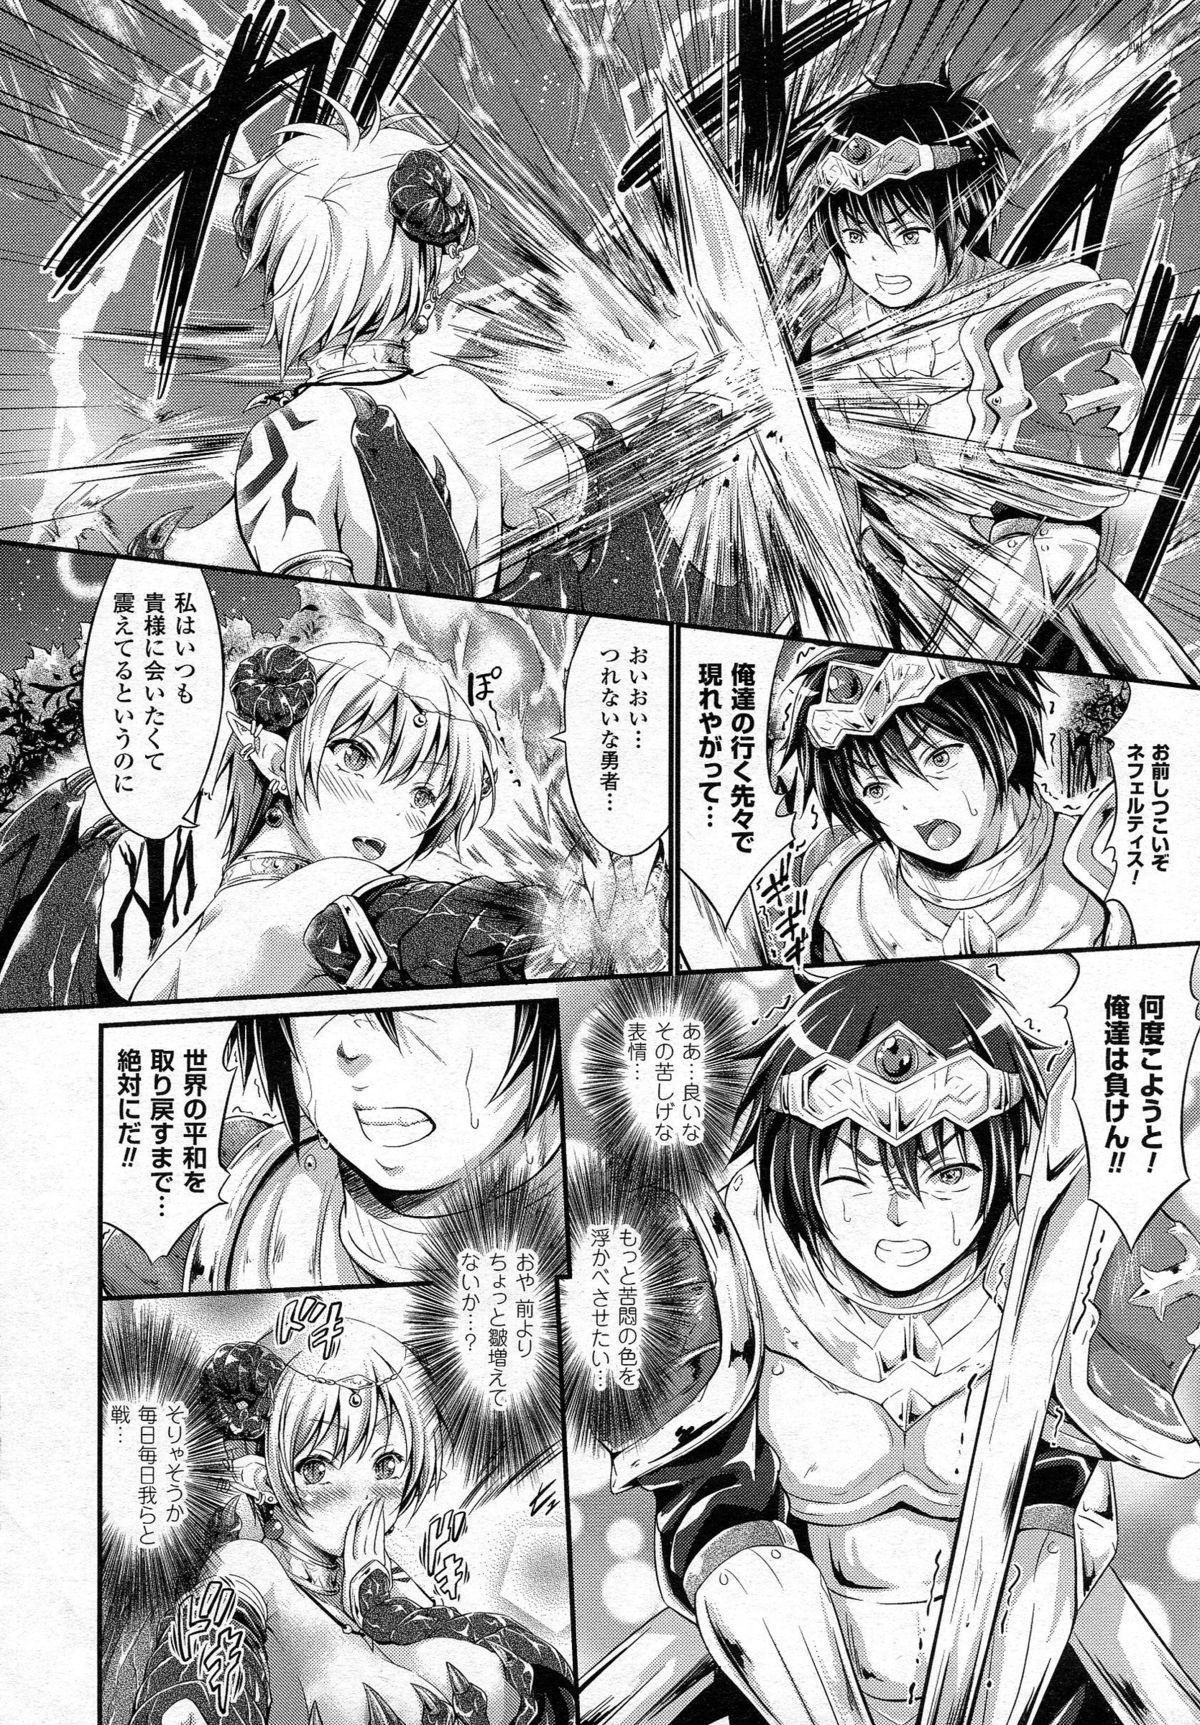 COMIC Unreal 2015-06 Vol. 55 + Hisasi Illust Shuu 375